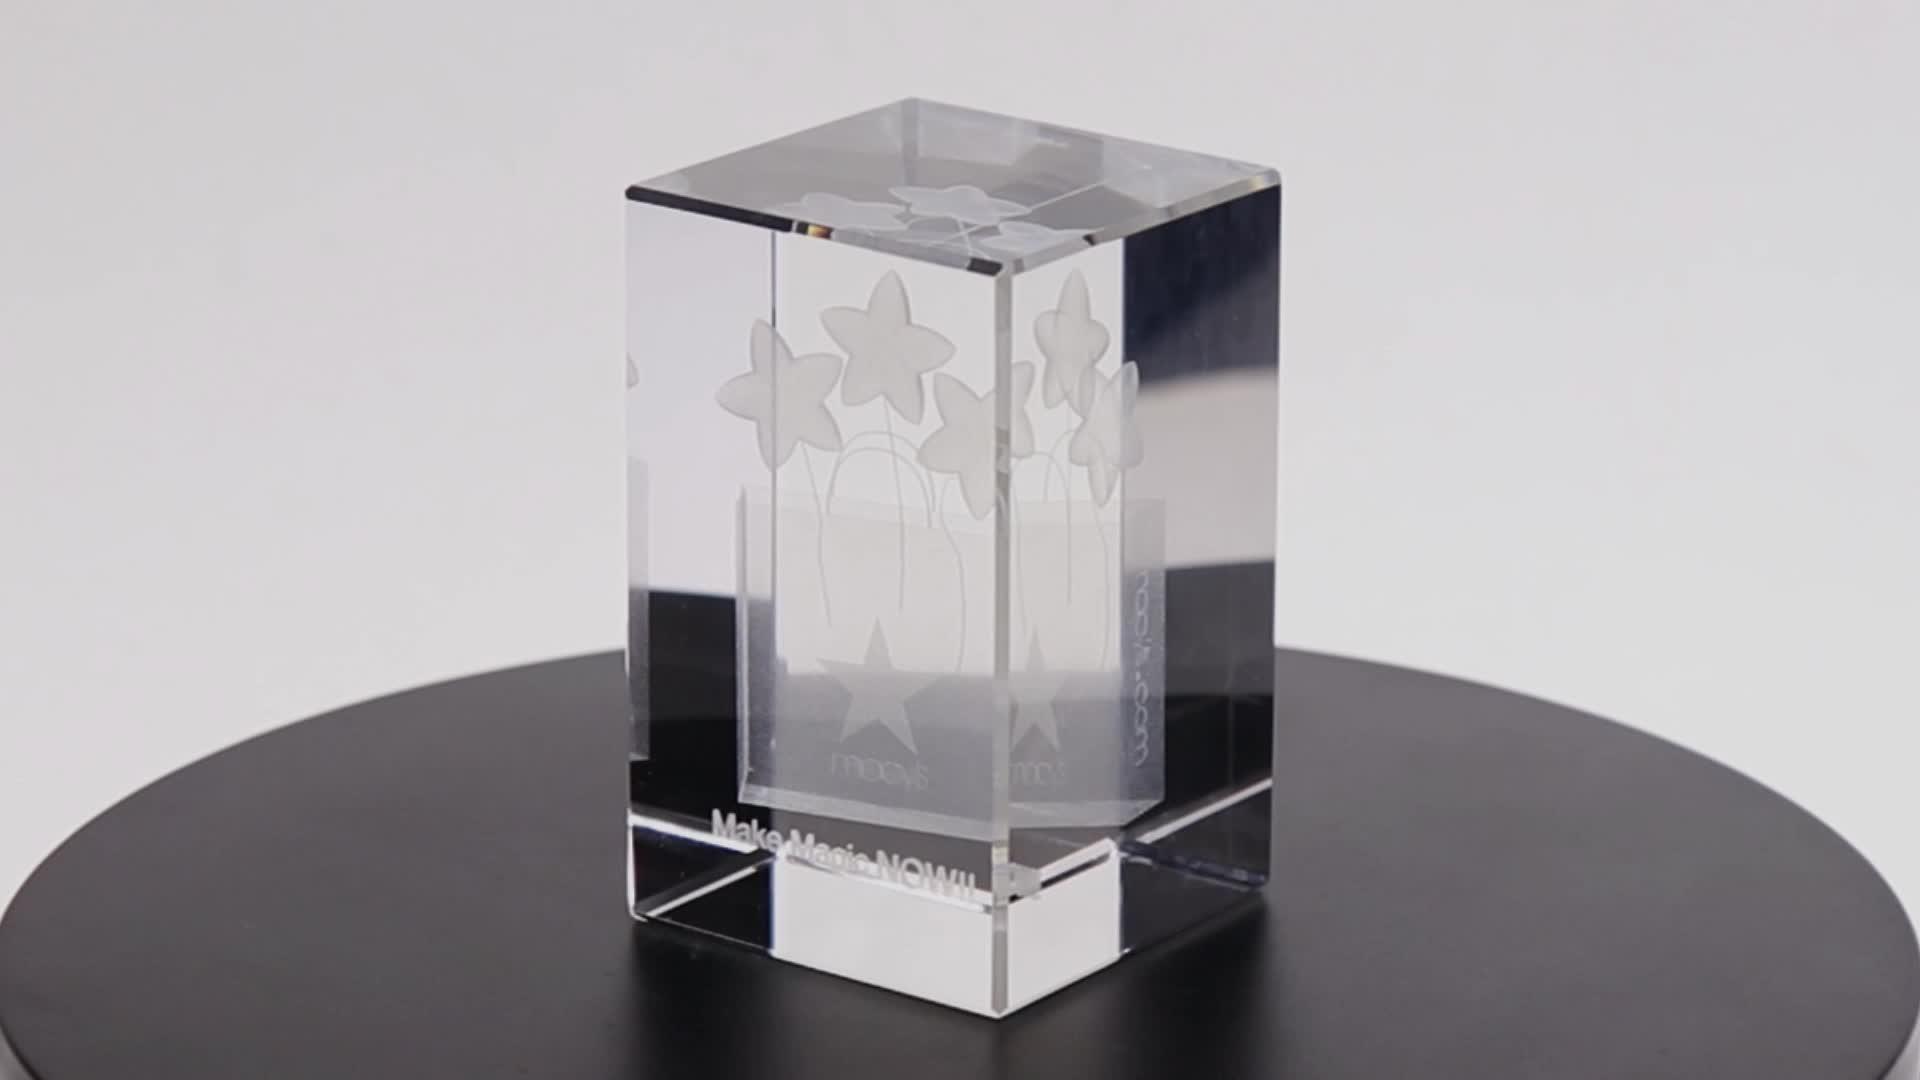 Belo 3D subiu cubo de cristal do laser com luz LED